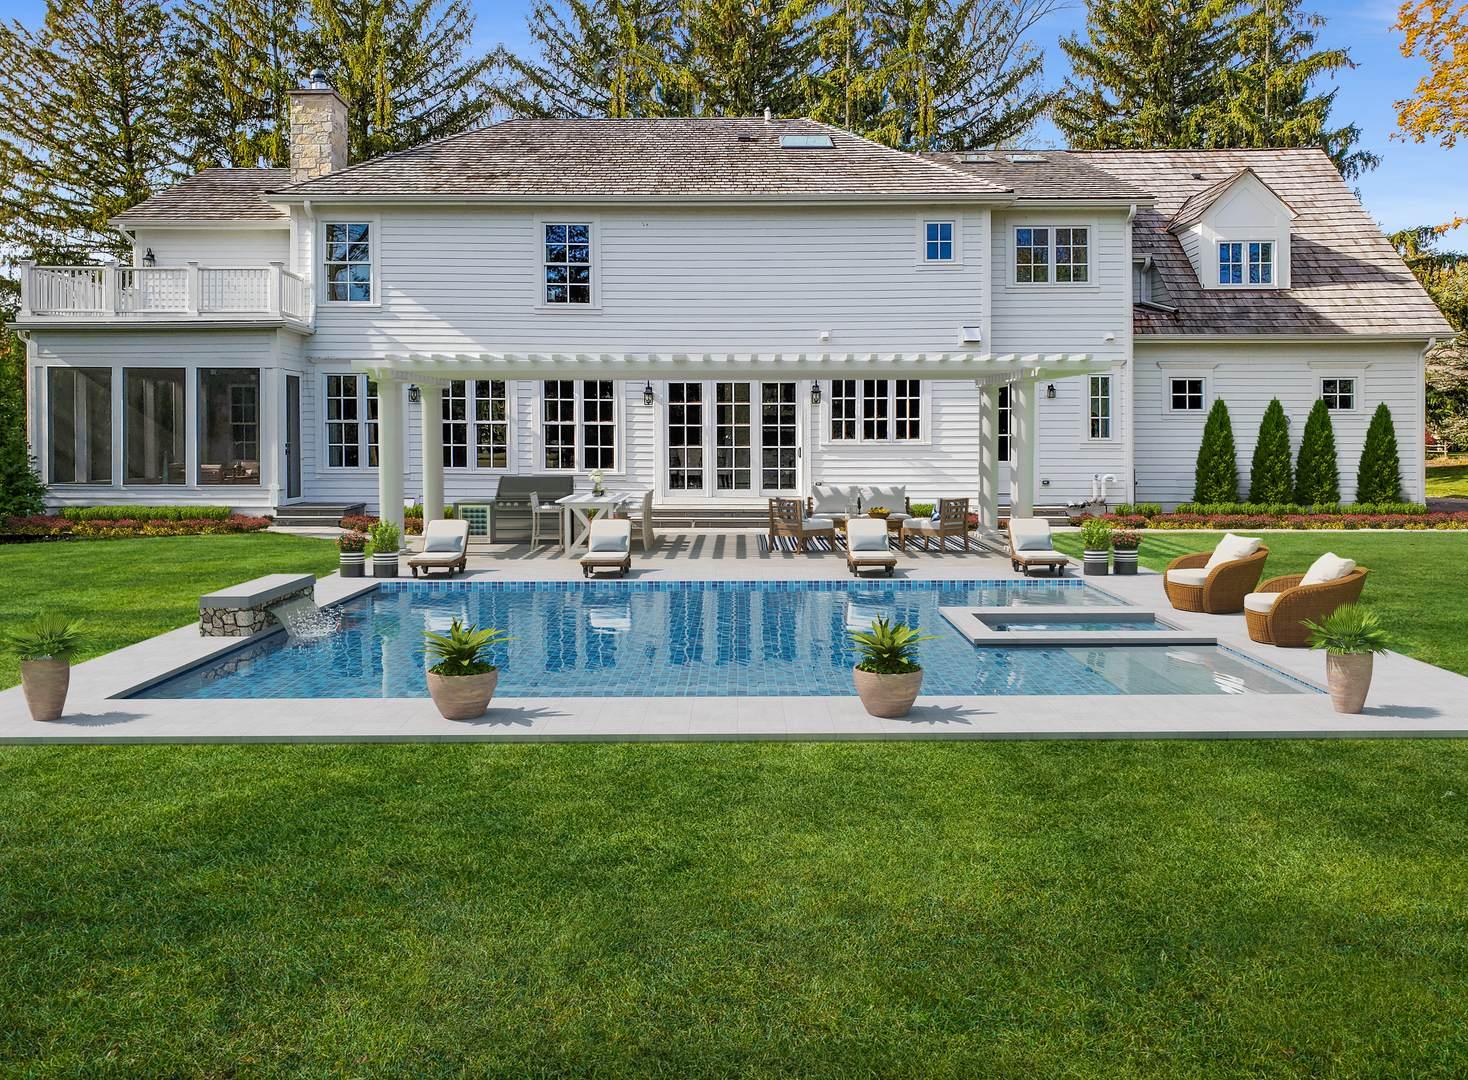 601 Chatham Road, Glenview, IL 60025 (MLS #10777511) :: Ryan Dallas Real Estate